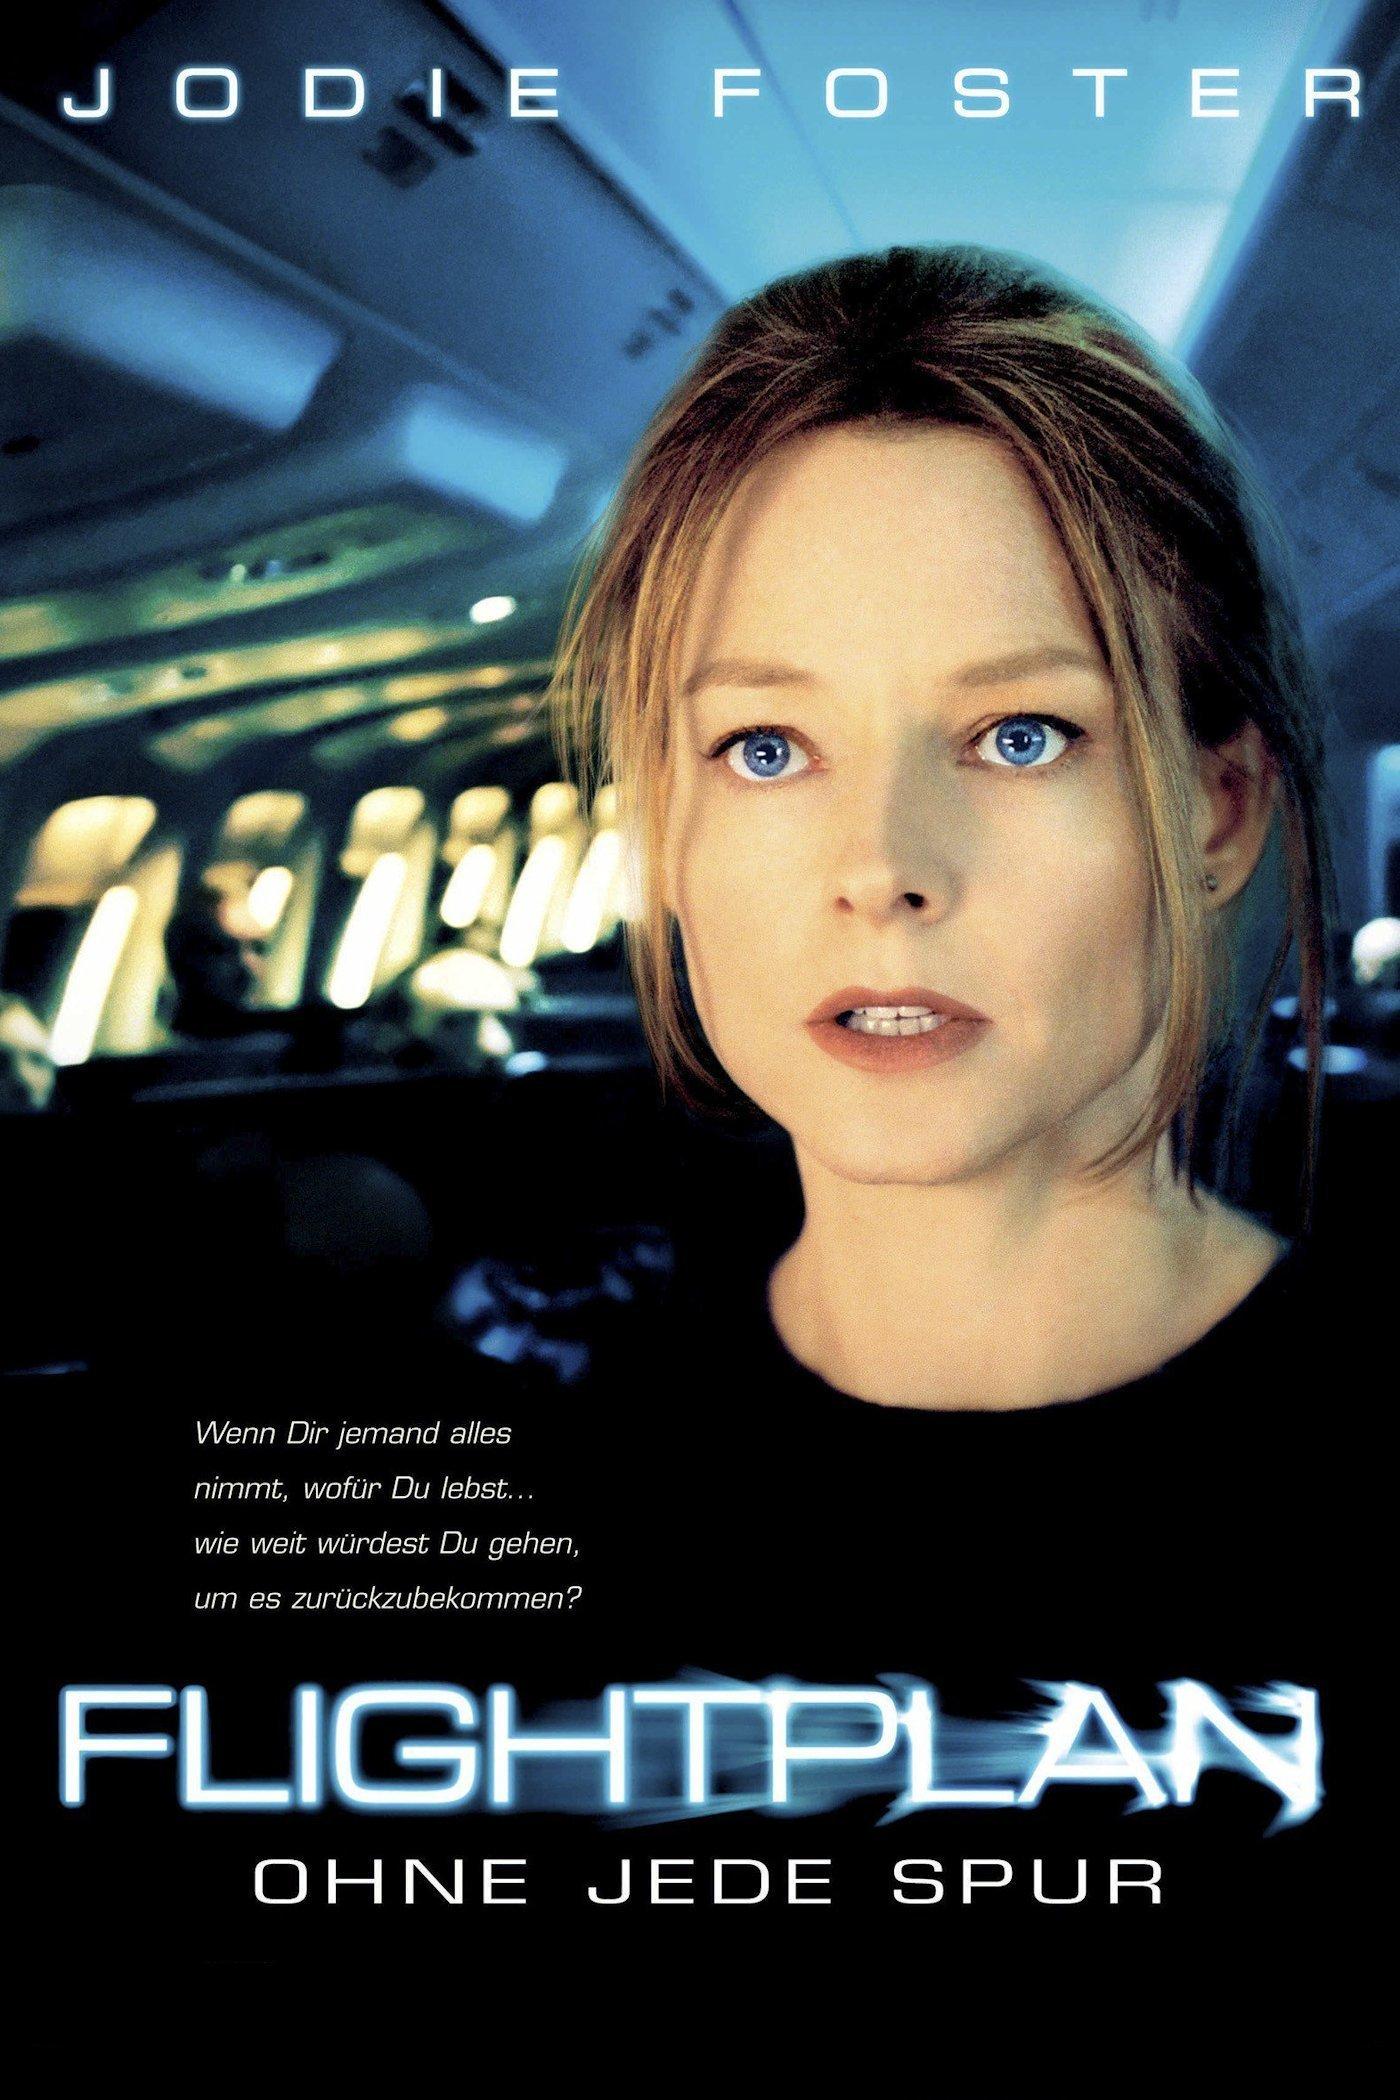 """Flightplan - Ohne jede Spur"""